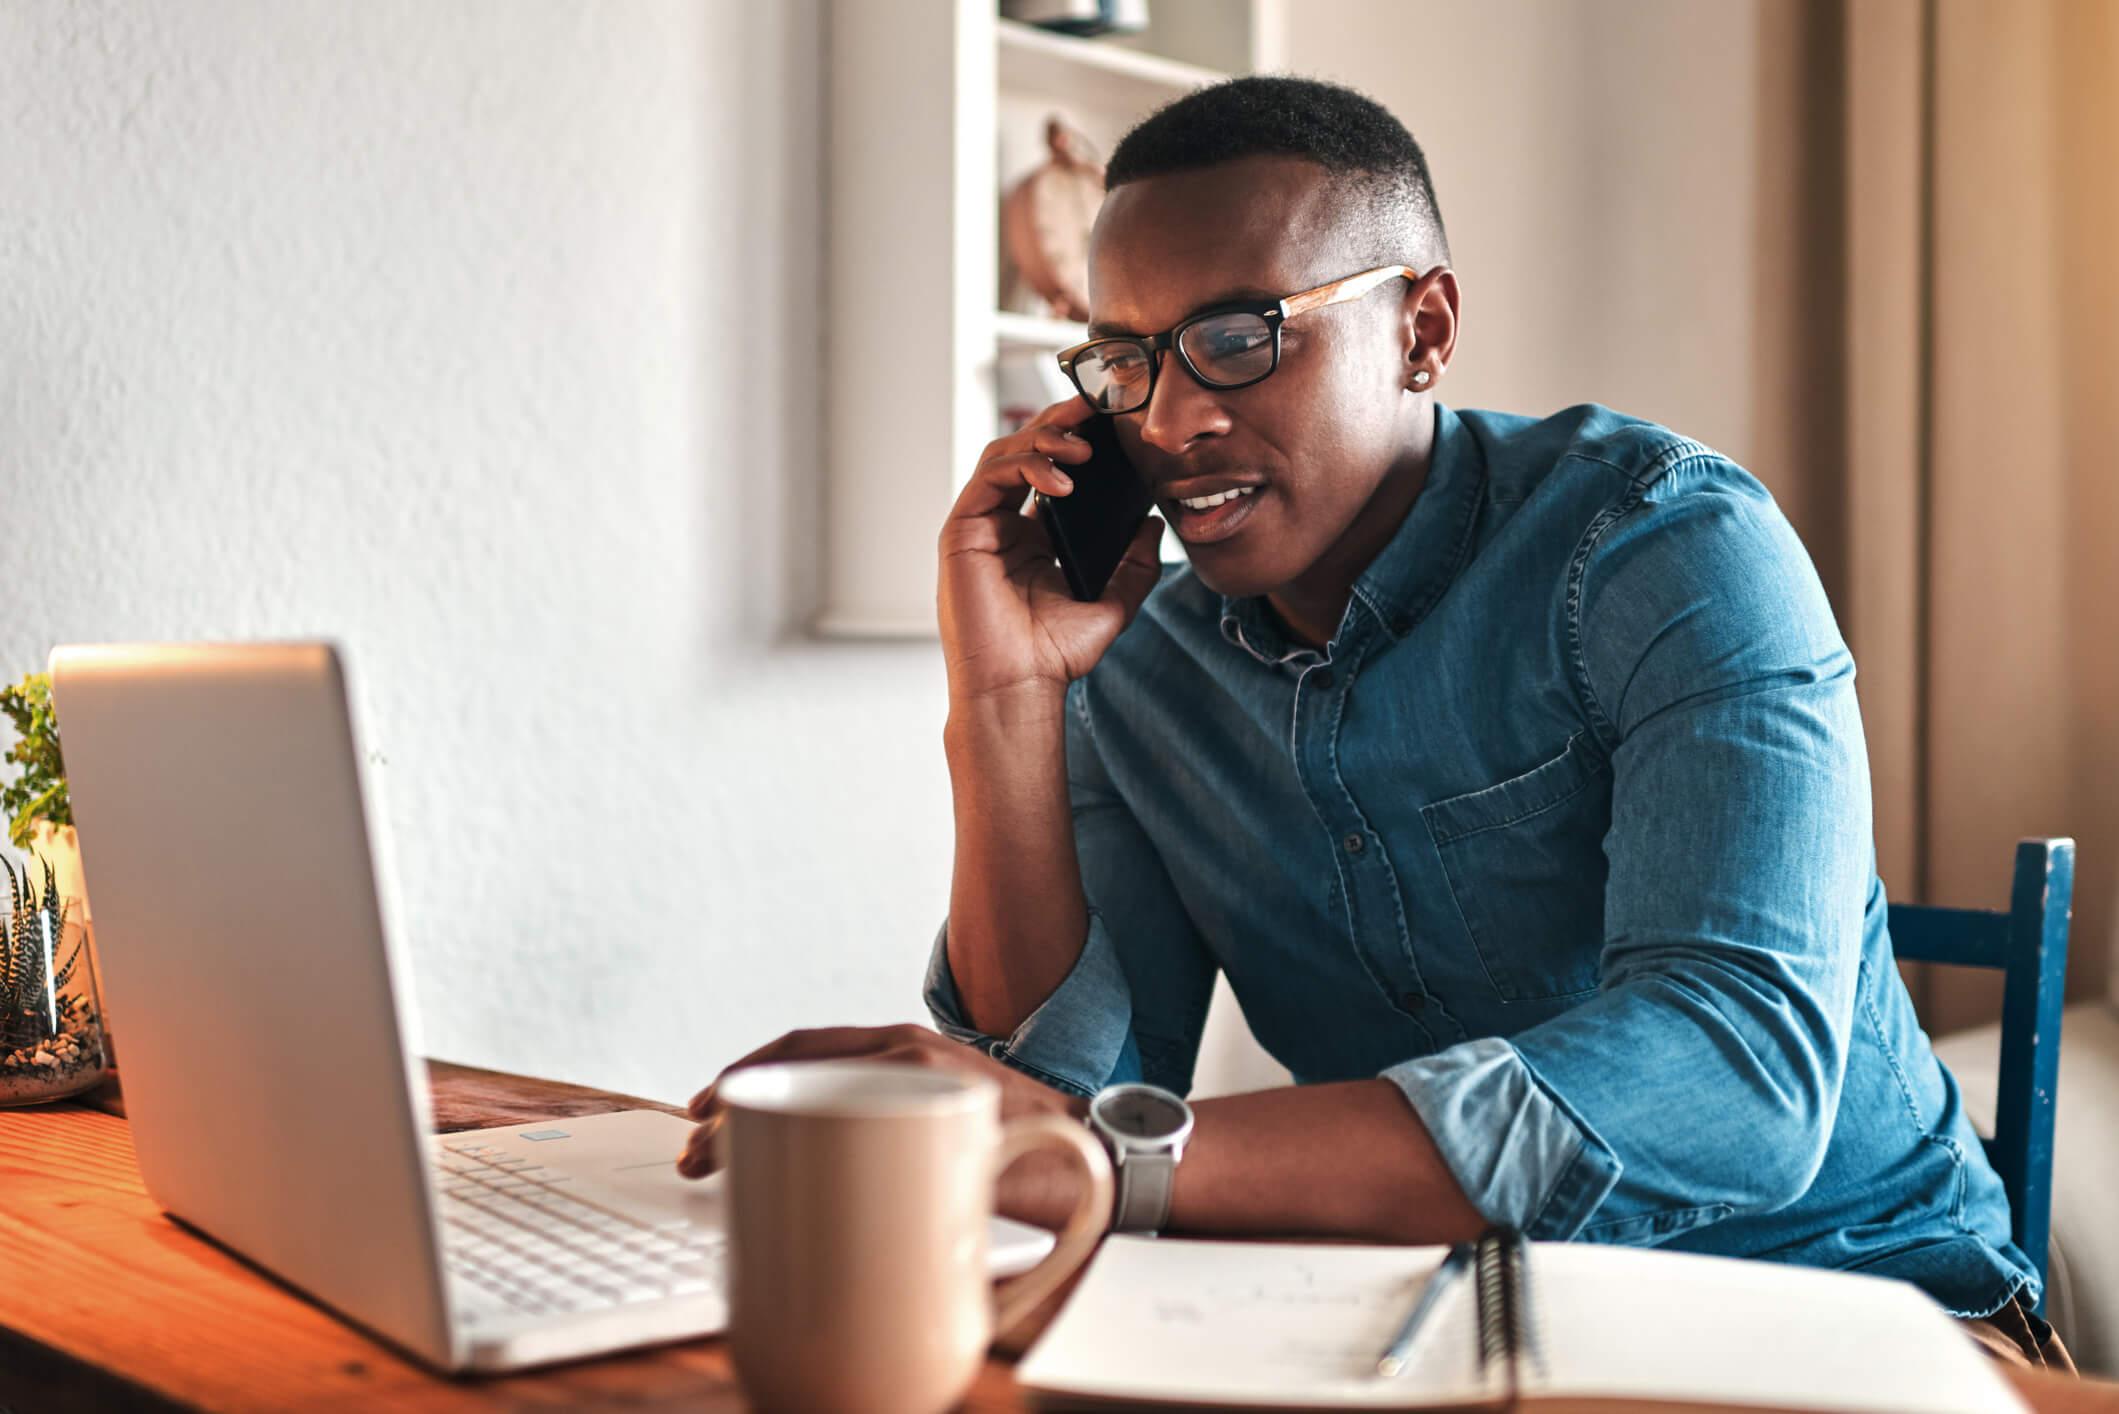 Man on phone using a laptop